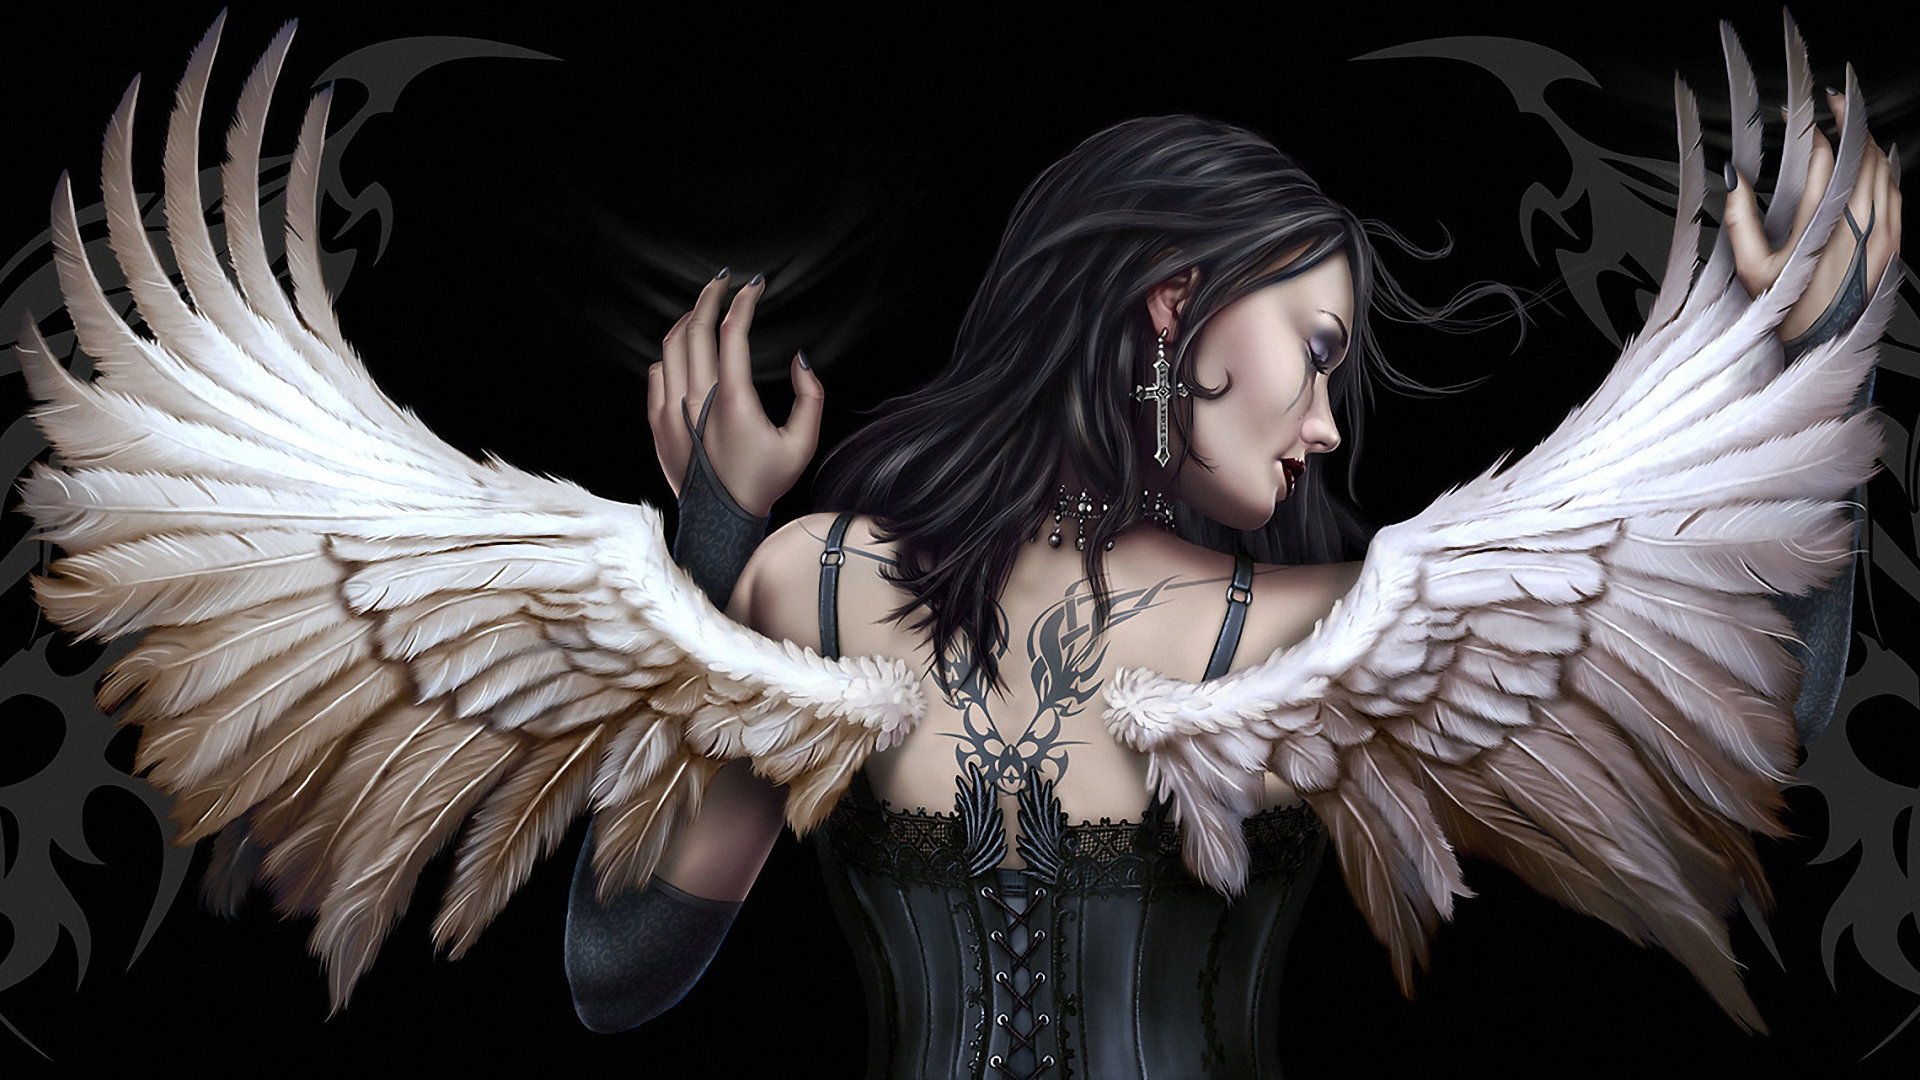 dark angel wallpapers 1920x1080 full hd 1080p desktop